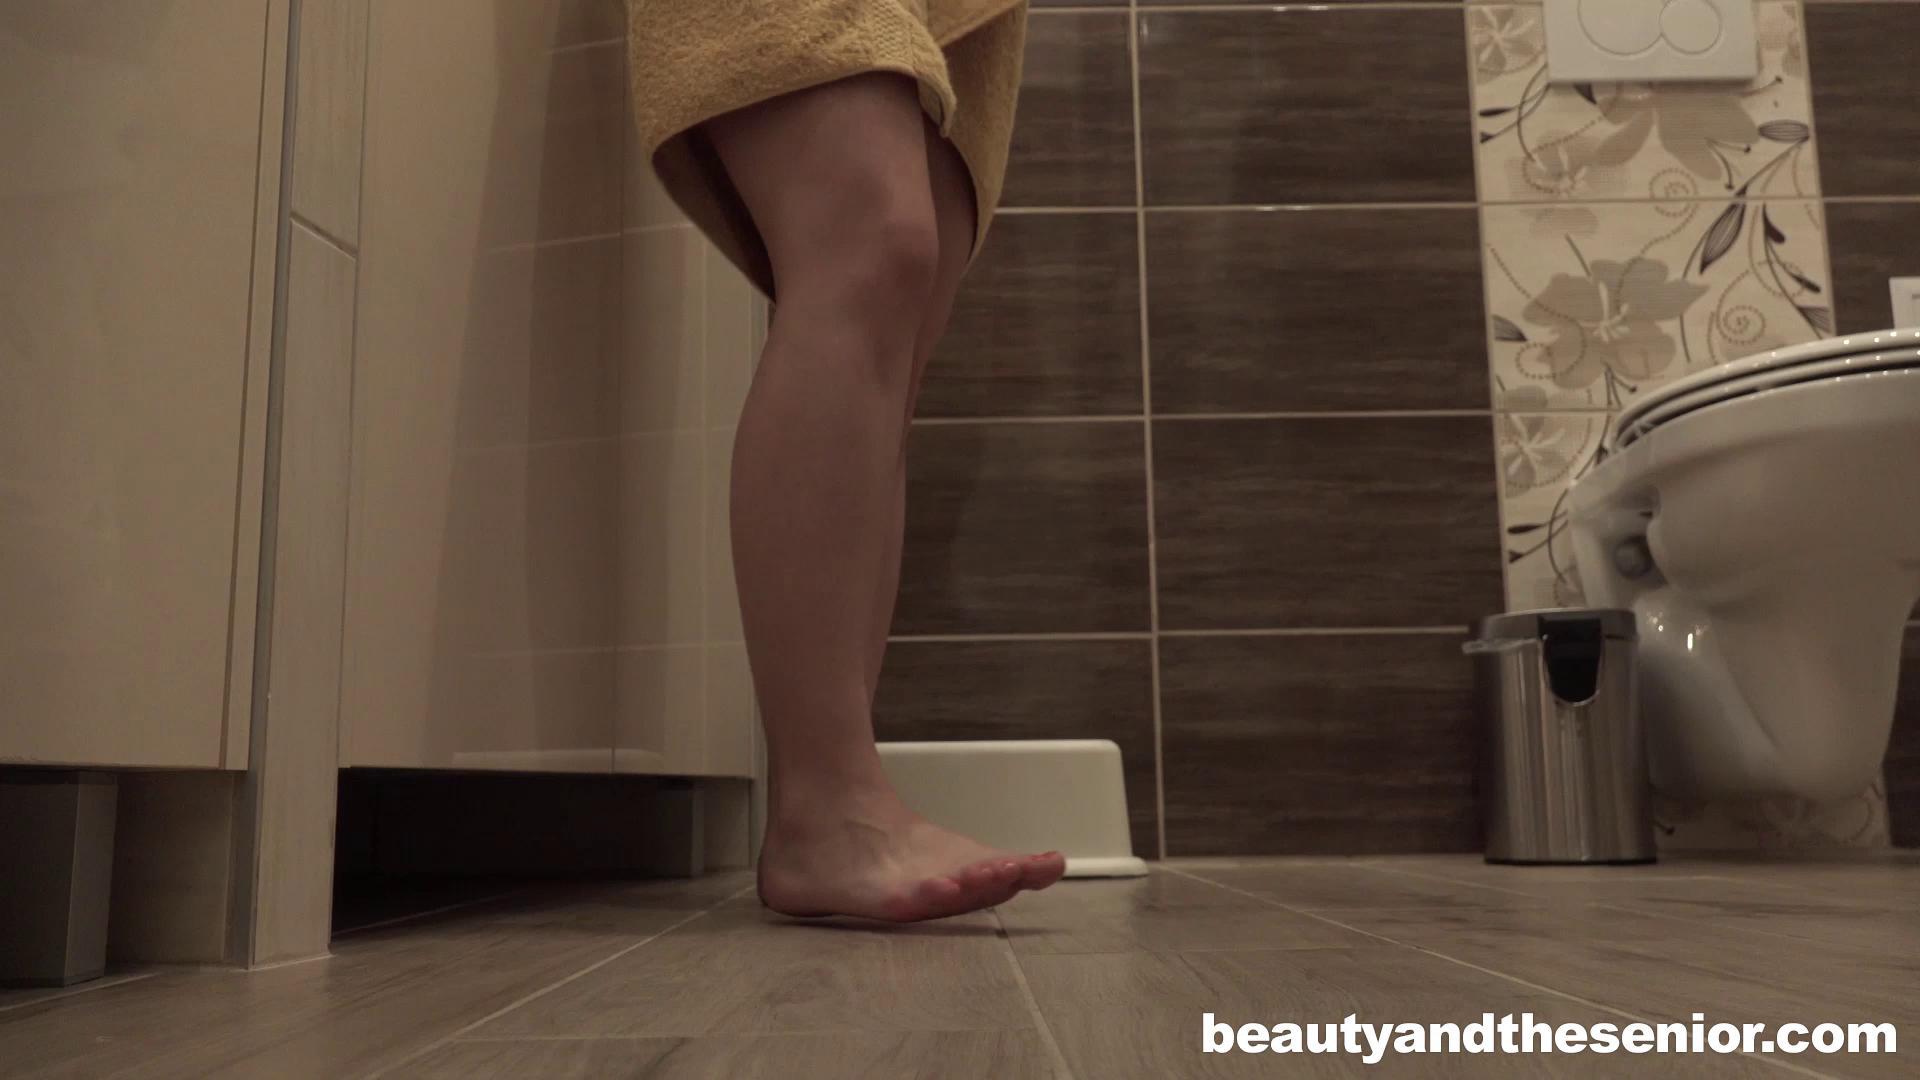 BeautyAndTheSenior – Lady Bug